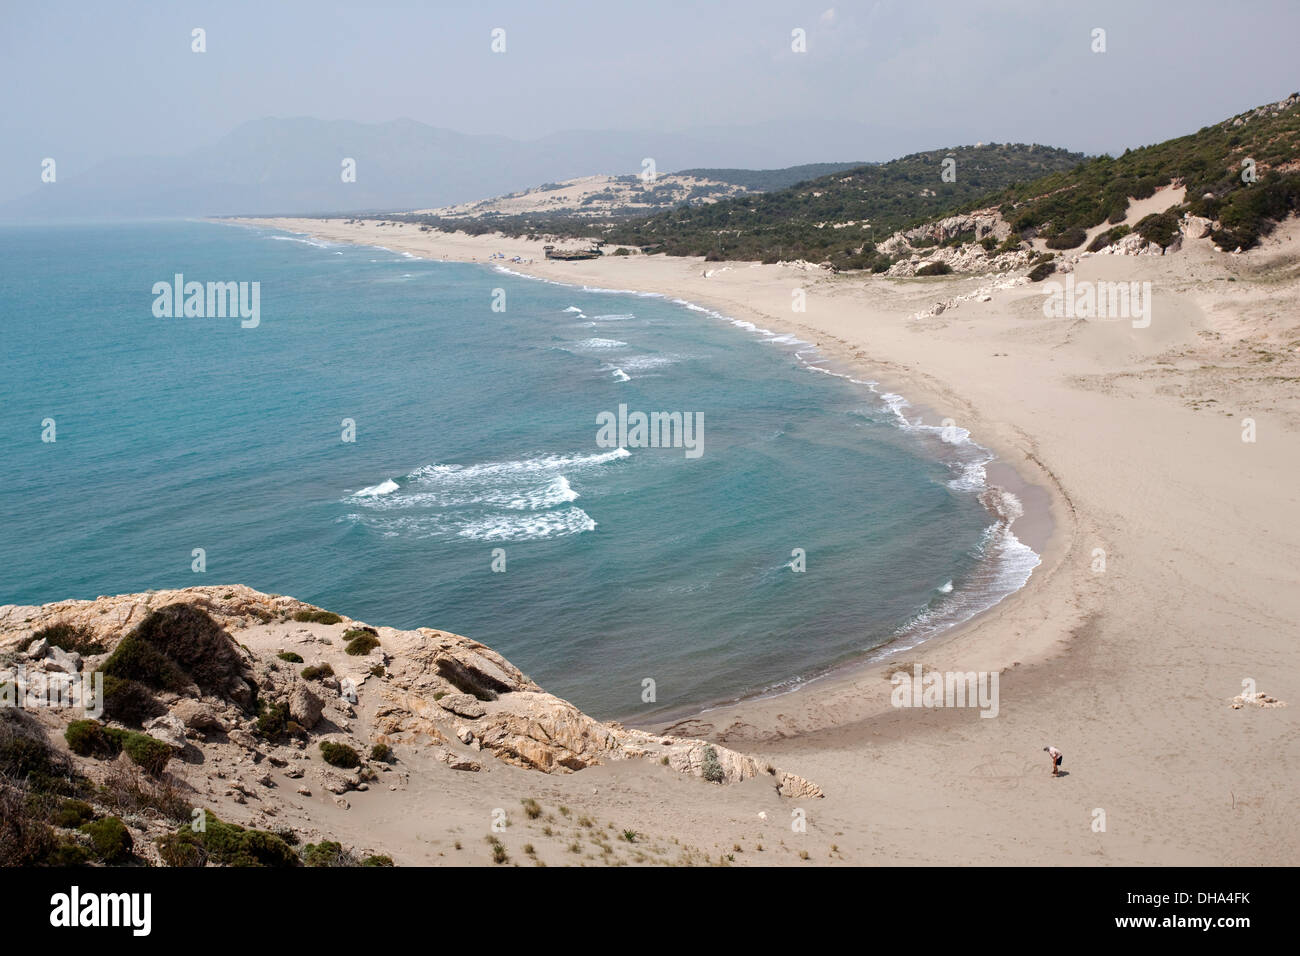 Patara the longest beach in Mediterranean with 26 km length Turkey - Stock Image